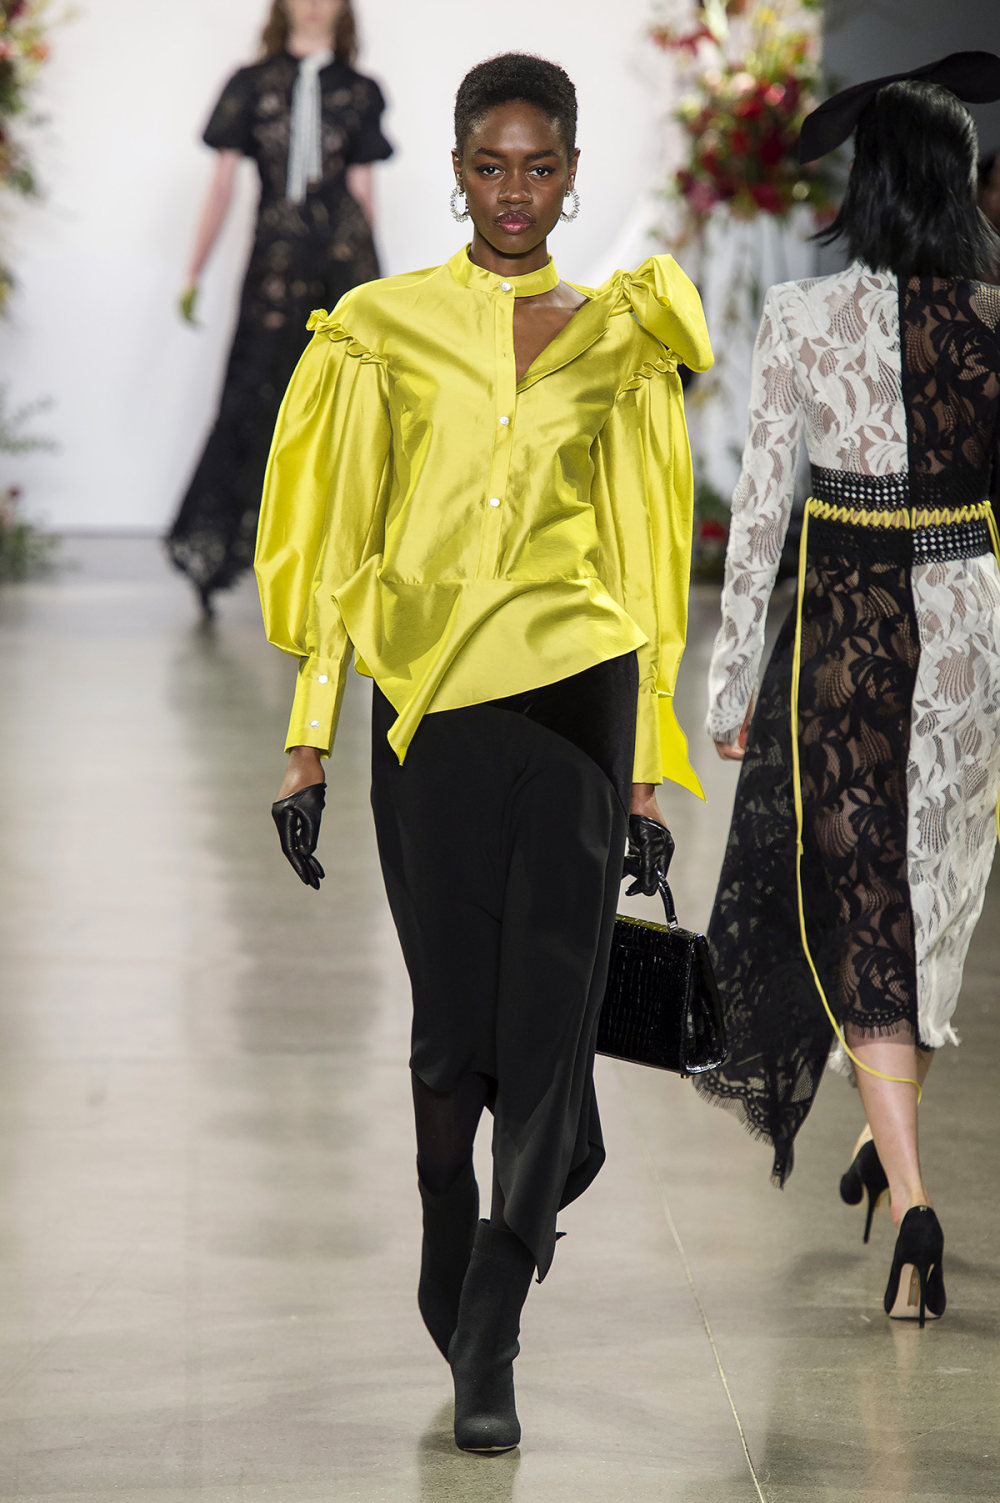 Bibhu Mohapatra时装系列颜色点缀蕾丝刺绣和结构的压轴礼服-4.jpg